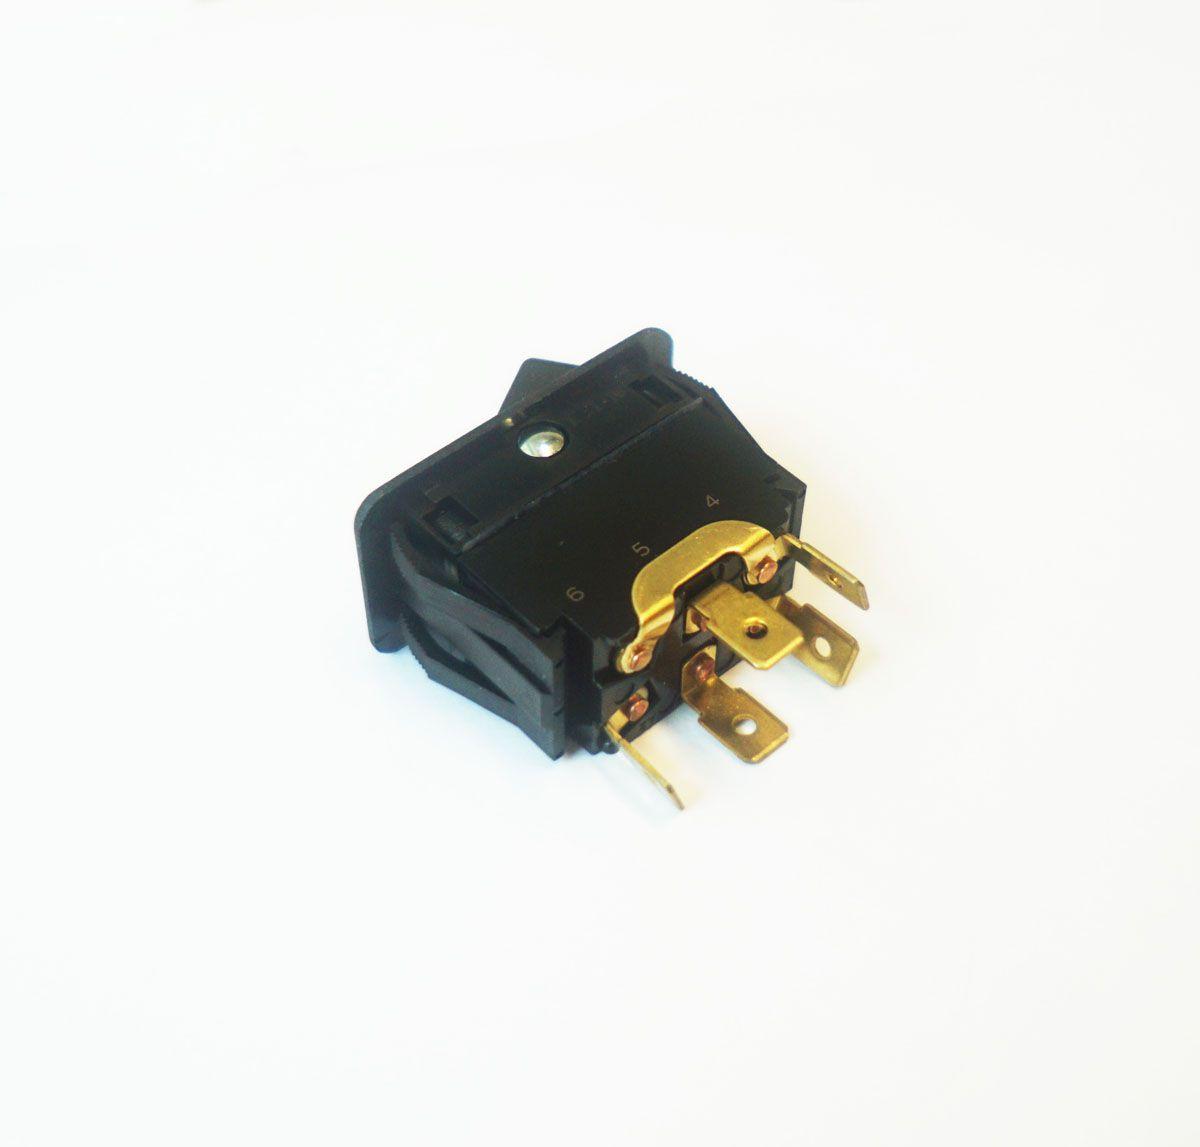 Interruptor de energia